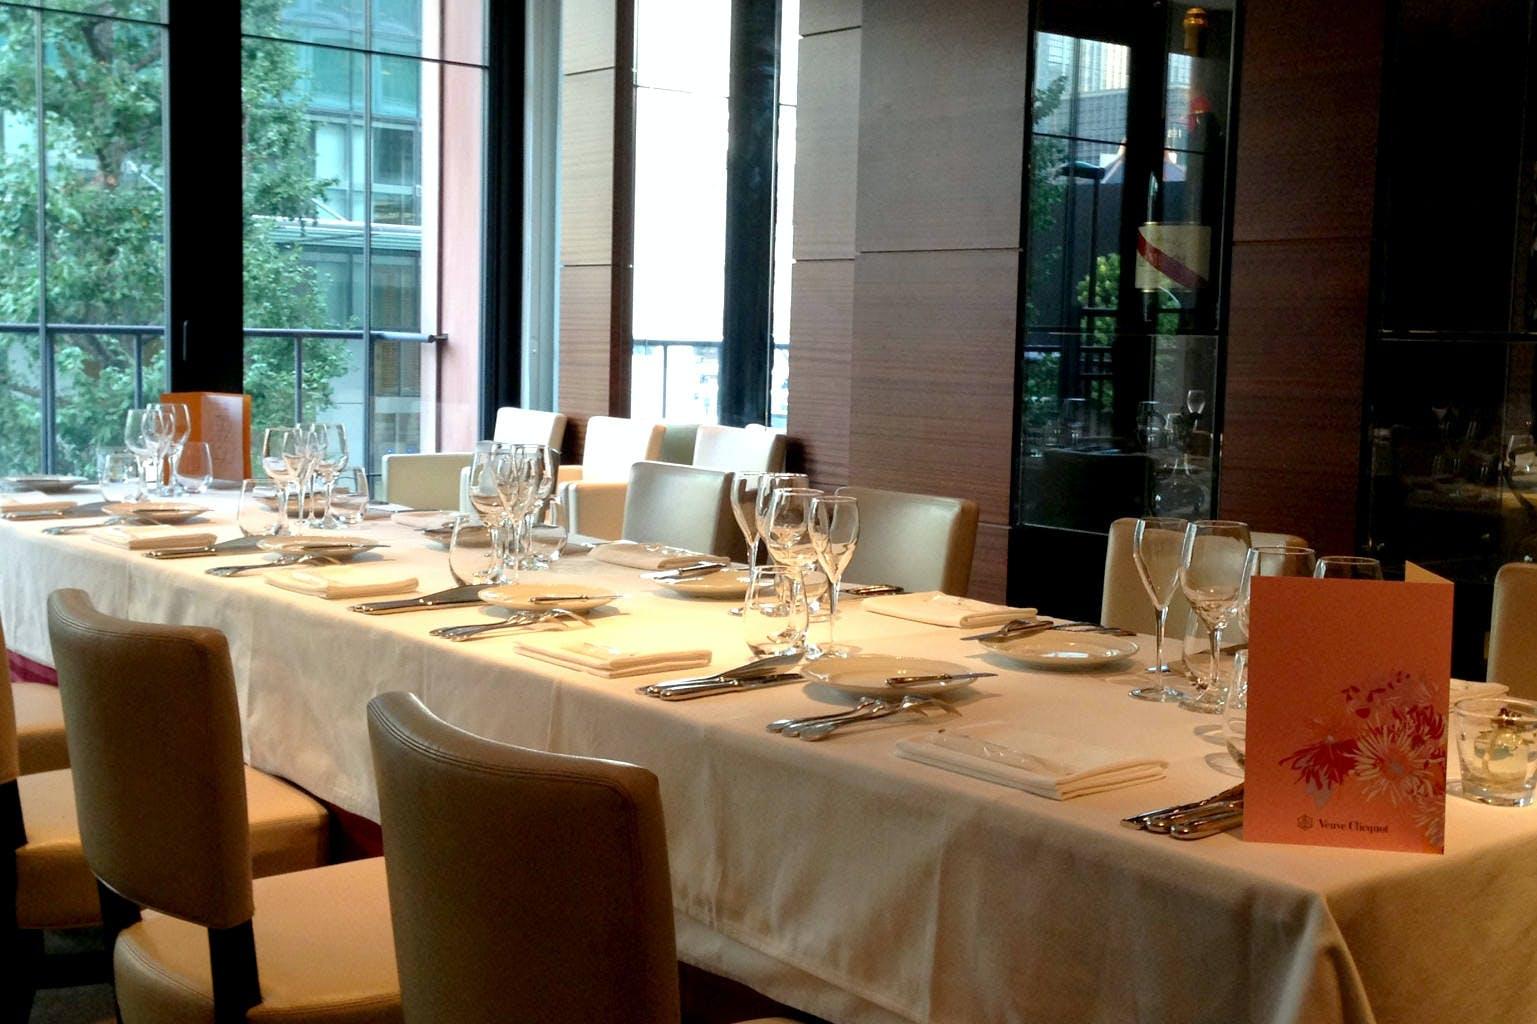 Restaurant Maison Barsac �i���]�� �o���T�b�N�j�y2F�z